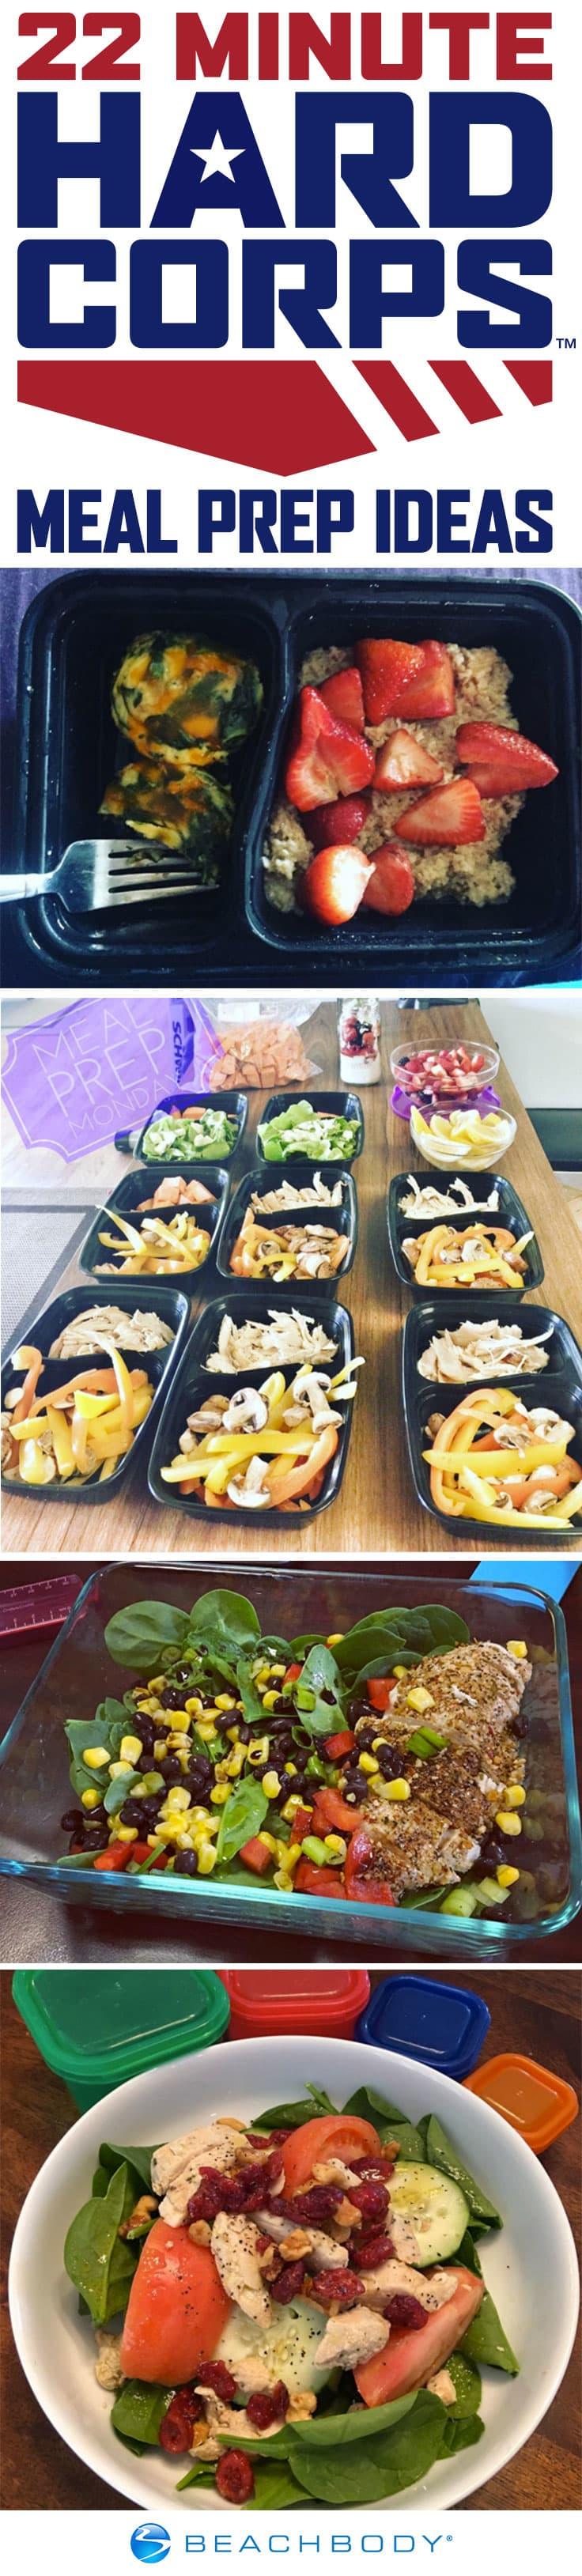 19 Inspiring Meal Prep Ideas for 22 Minute Hard Corps | BeachbodyBlog.com